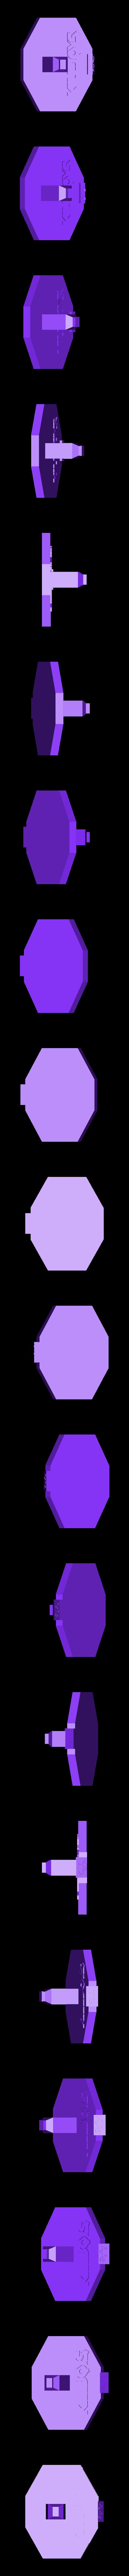 KillJoy_Stand_01.stl Download free STL file Killjoys - Lucy • 3D printer template, SYFY